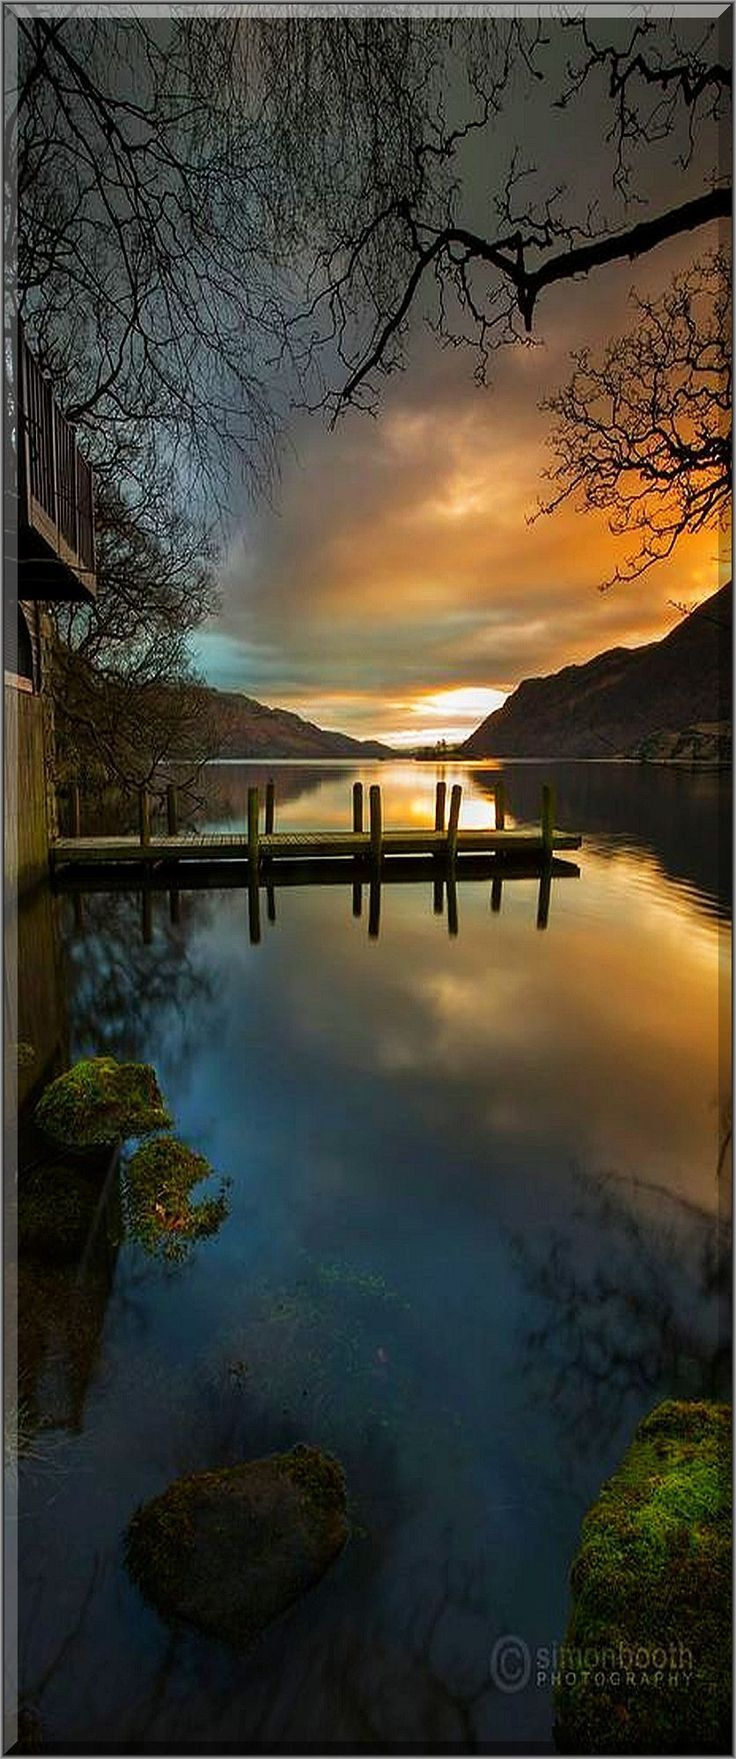 Ullswater Boathouse, Lake District National Park - UK England #photo by Simon Booth #landscape nature sunset reflection lake  Aergo Wanderlust Approved! #LandscapeSunset